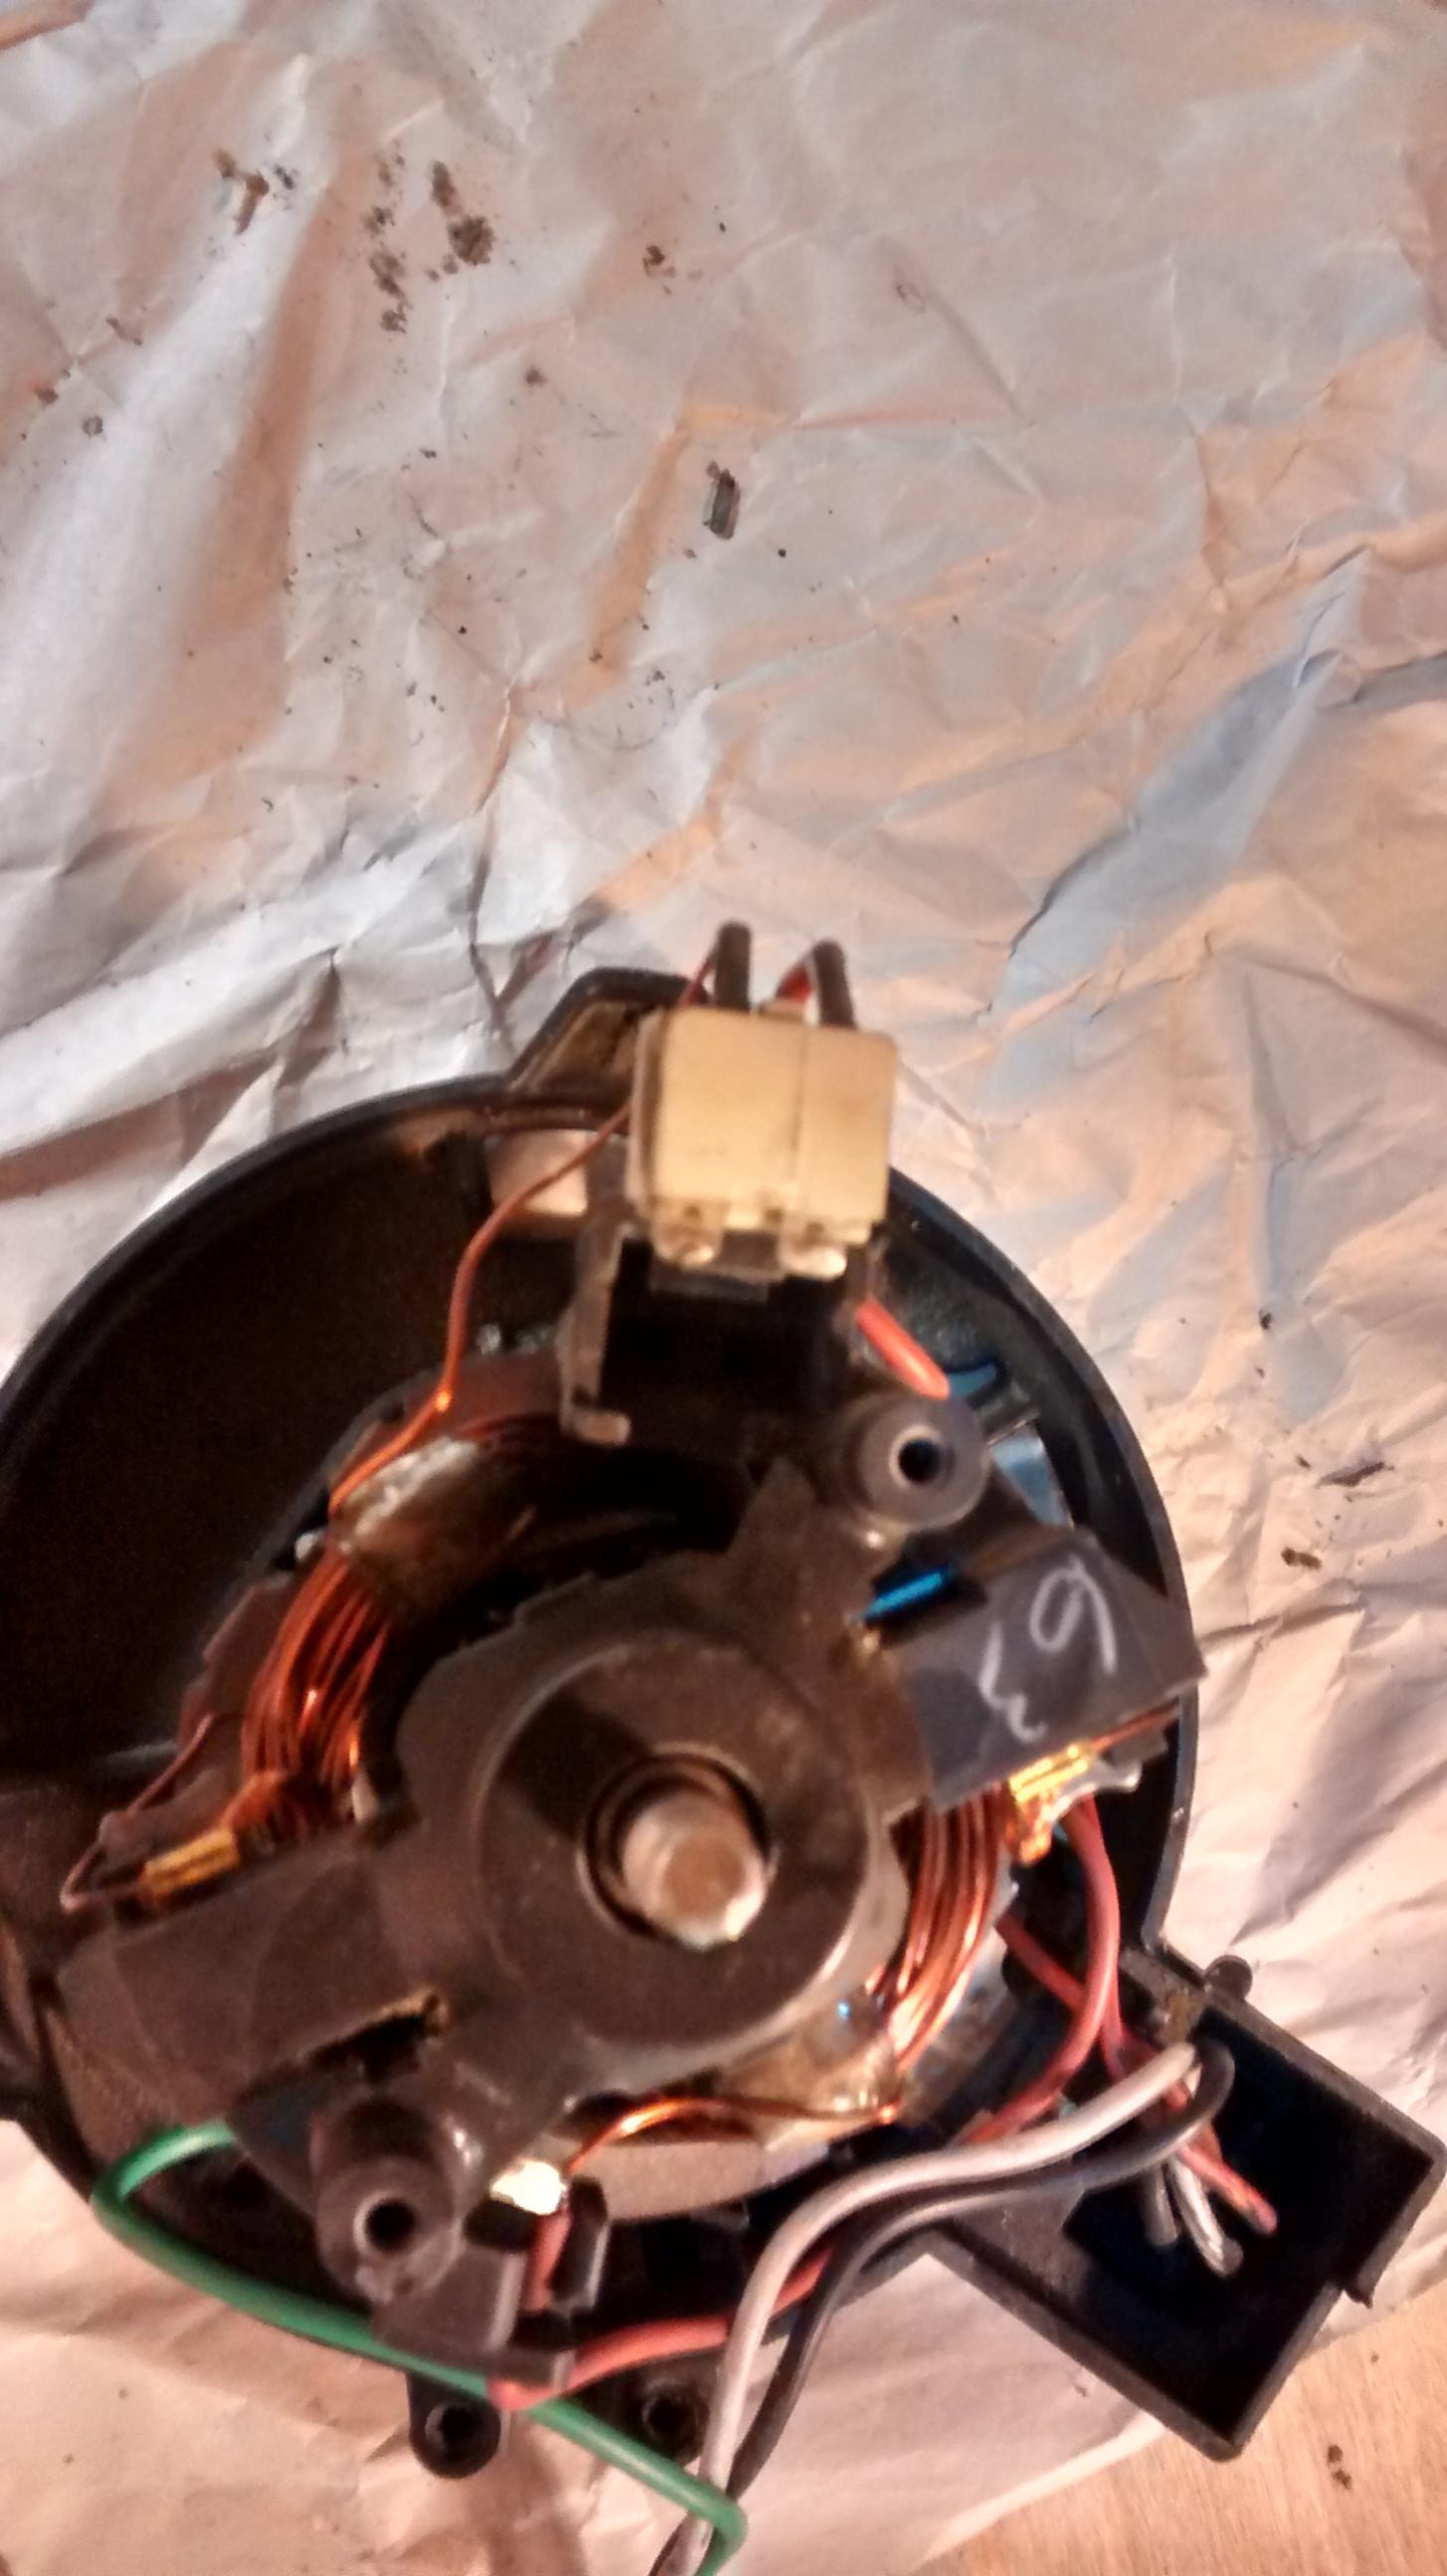 Ot Shop Vac Motor Repair Techtalk Speaker Building Audio Video Discussion Forum